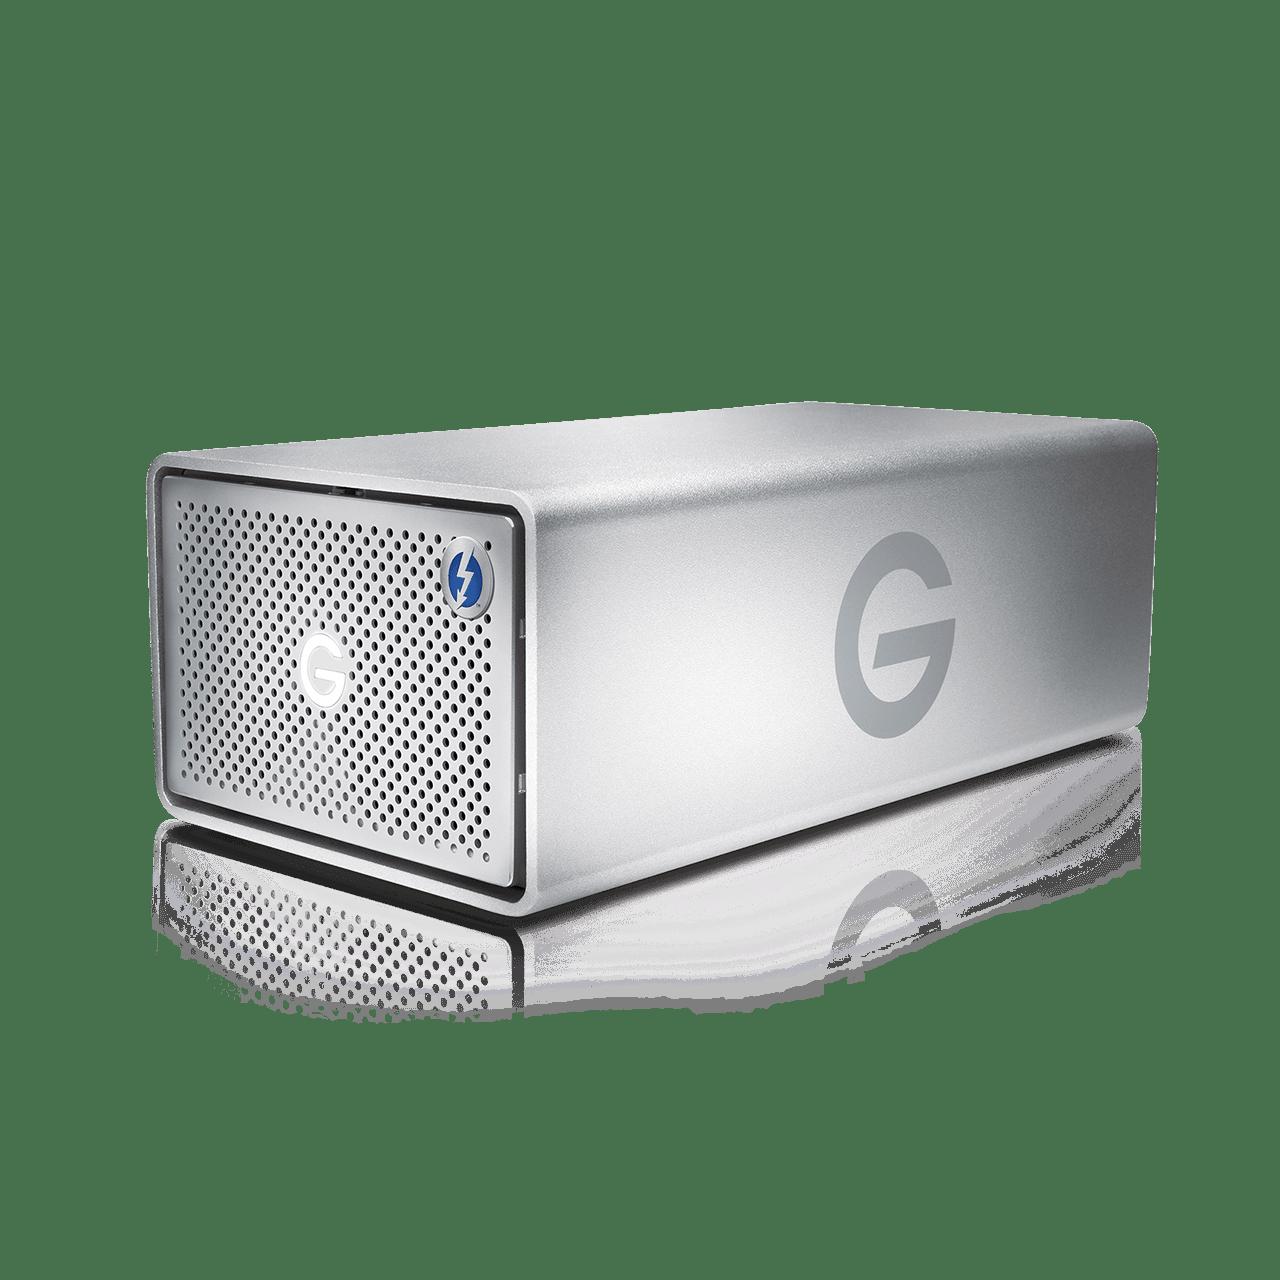 g-raid-thunderbolt-3-removable-hero1-png-thumb-1280-1280